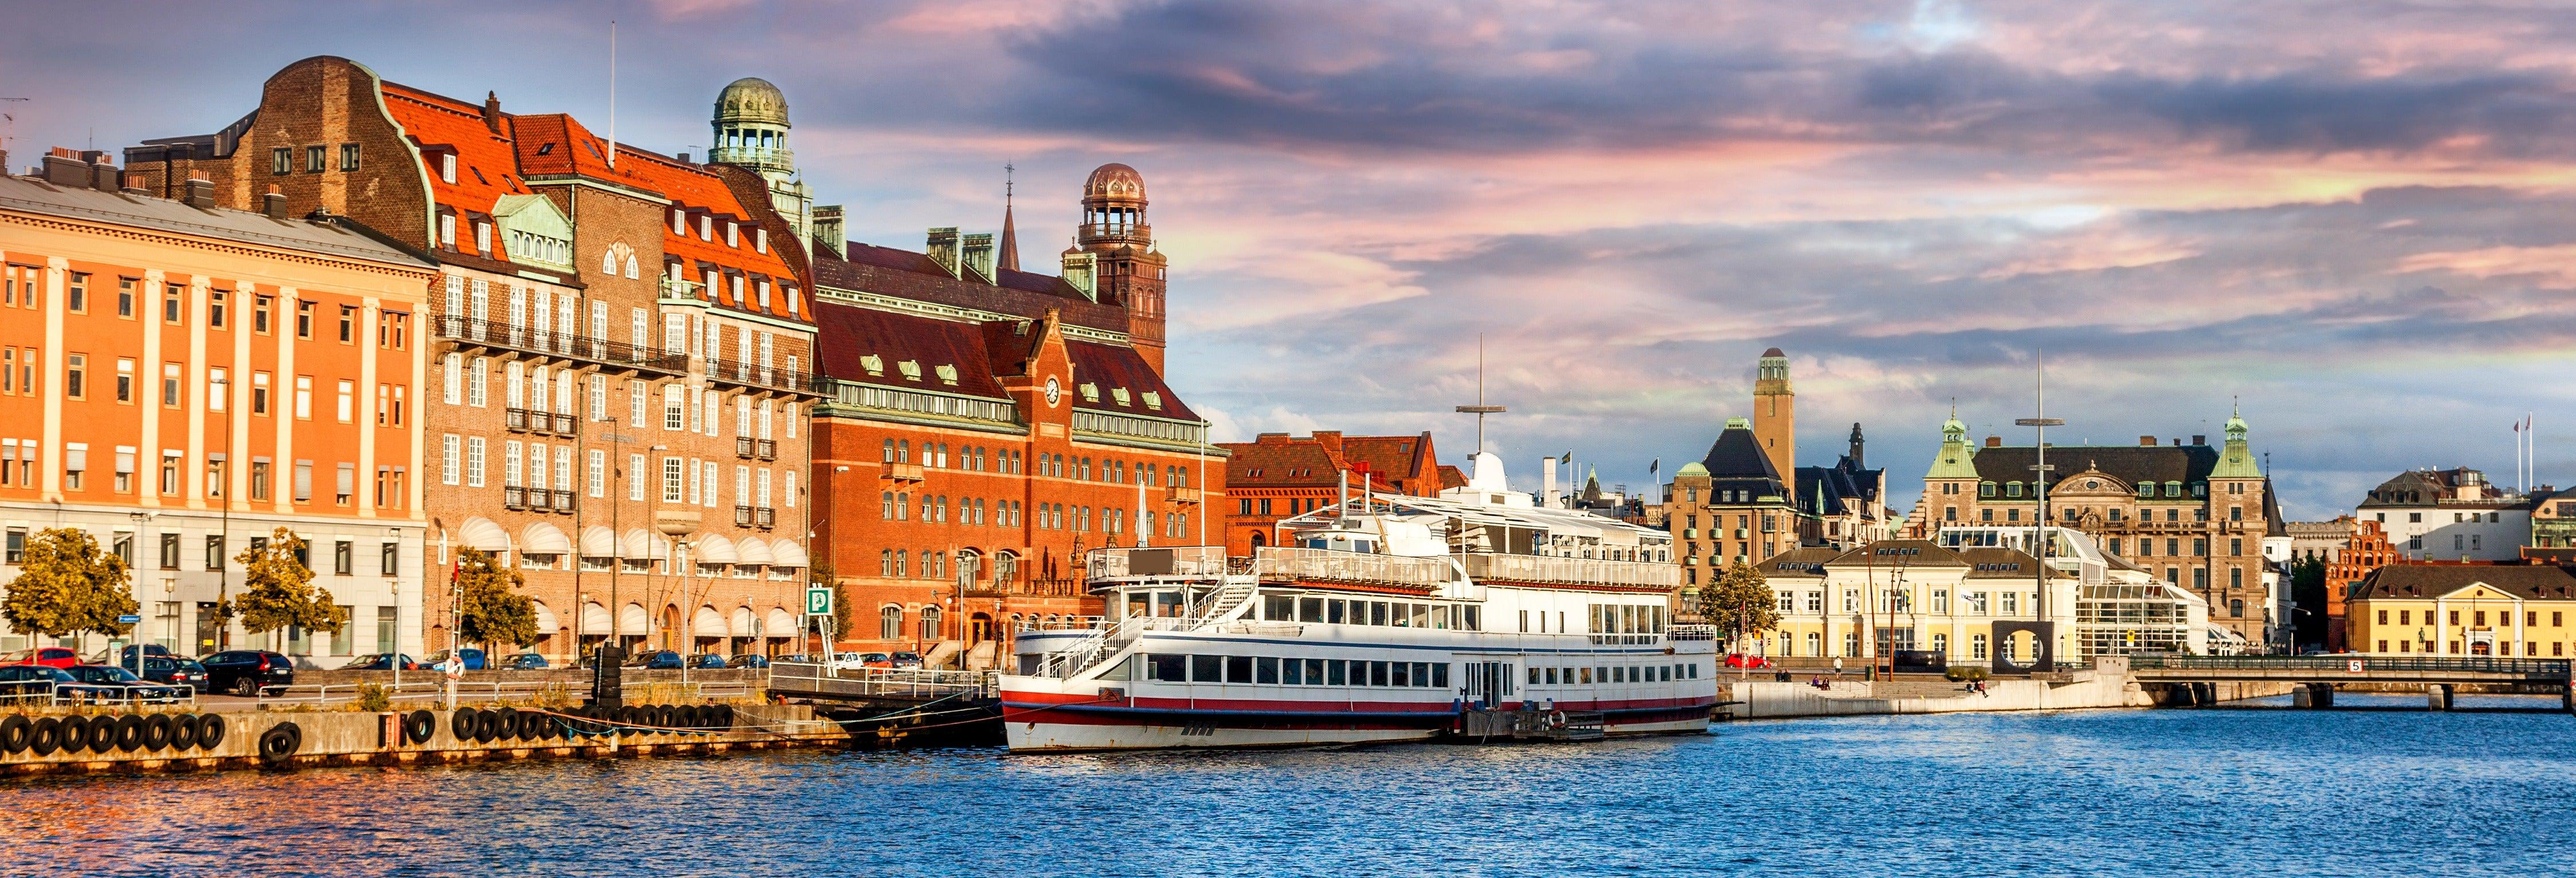 Passeio de barco pelos canais de Malmö